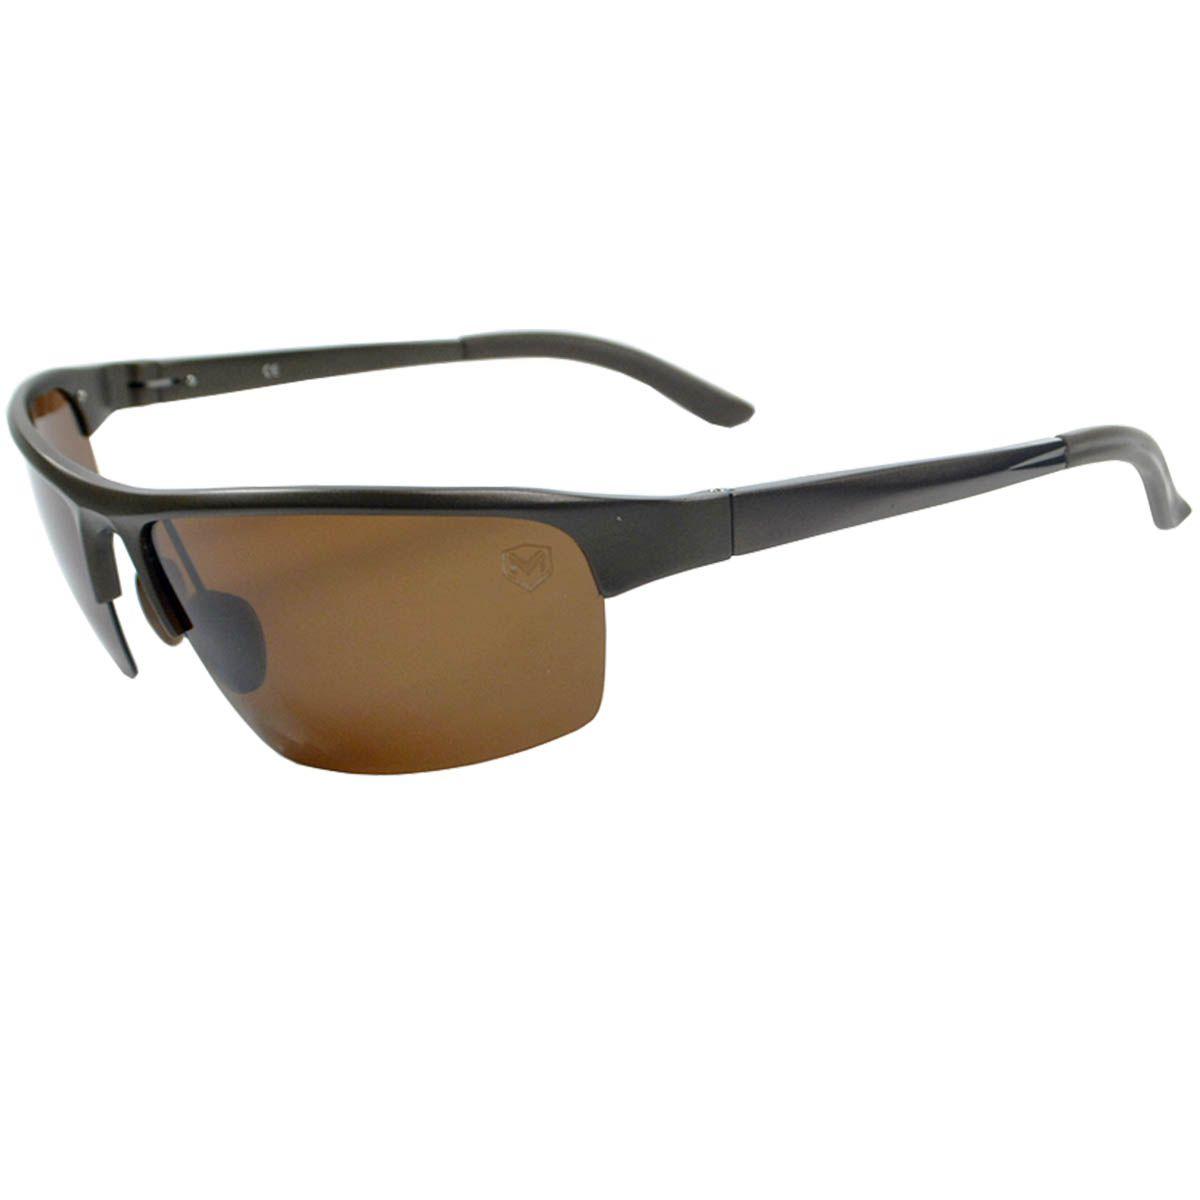 a72fab7f3 Óculos De Sol Polarizado Mackage MKB030MP Marrom